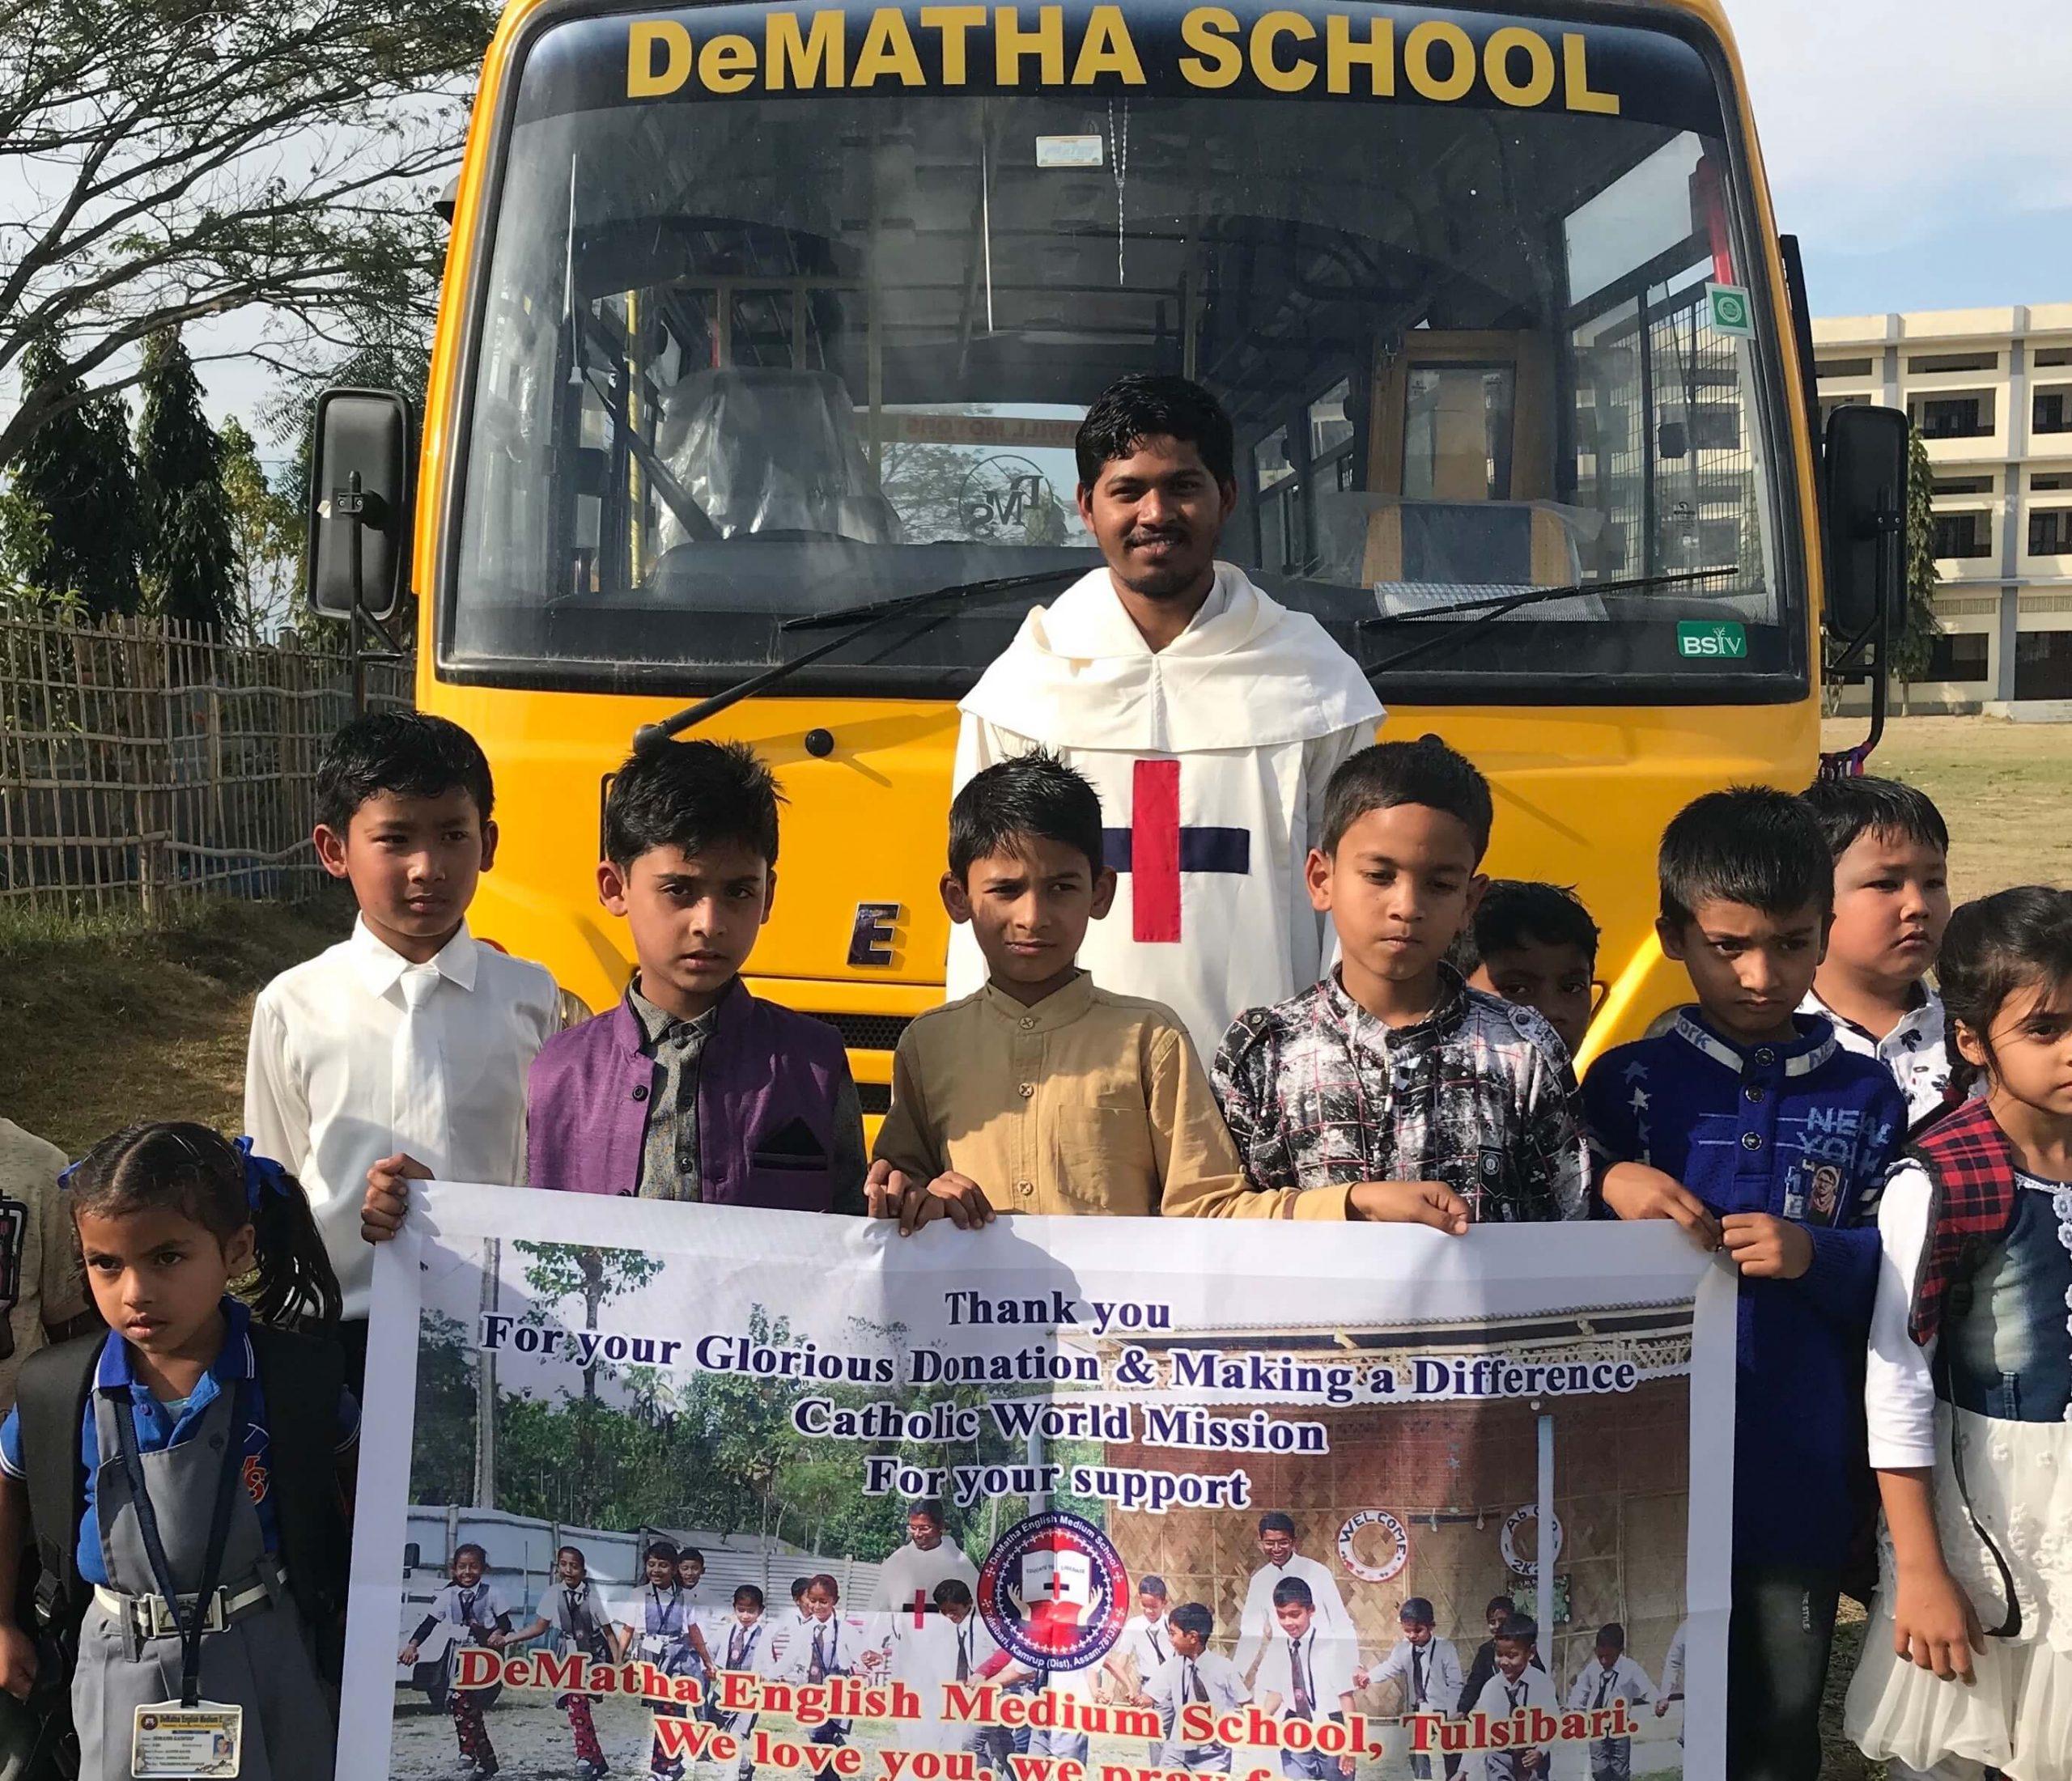 India Trinitarian Fathers Bus